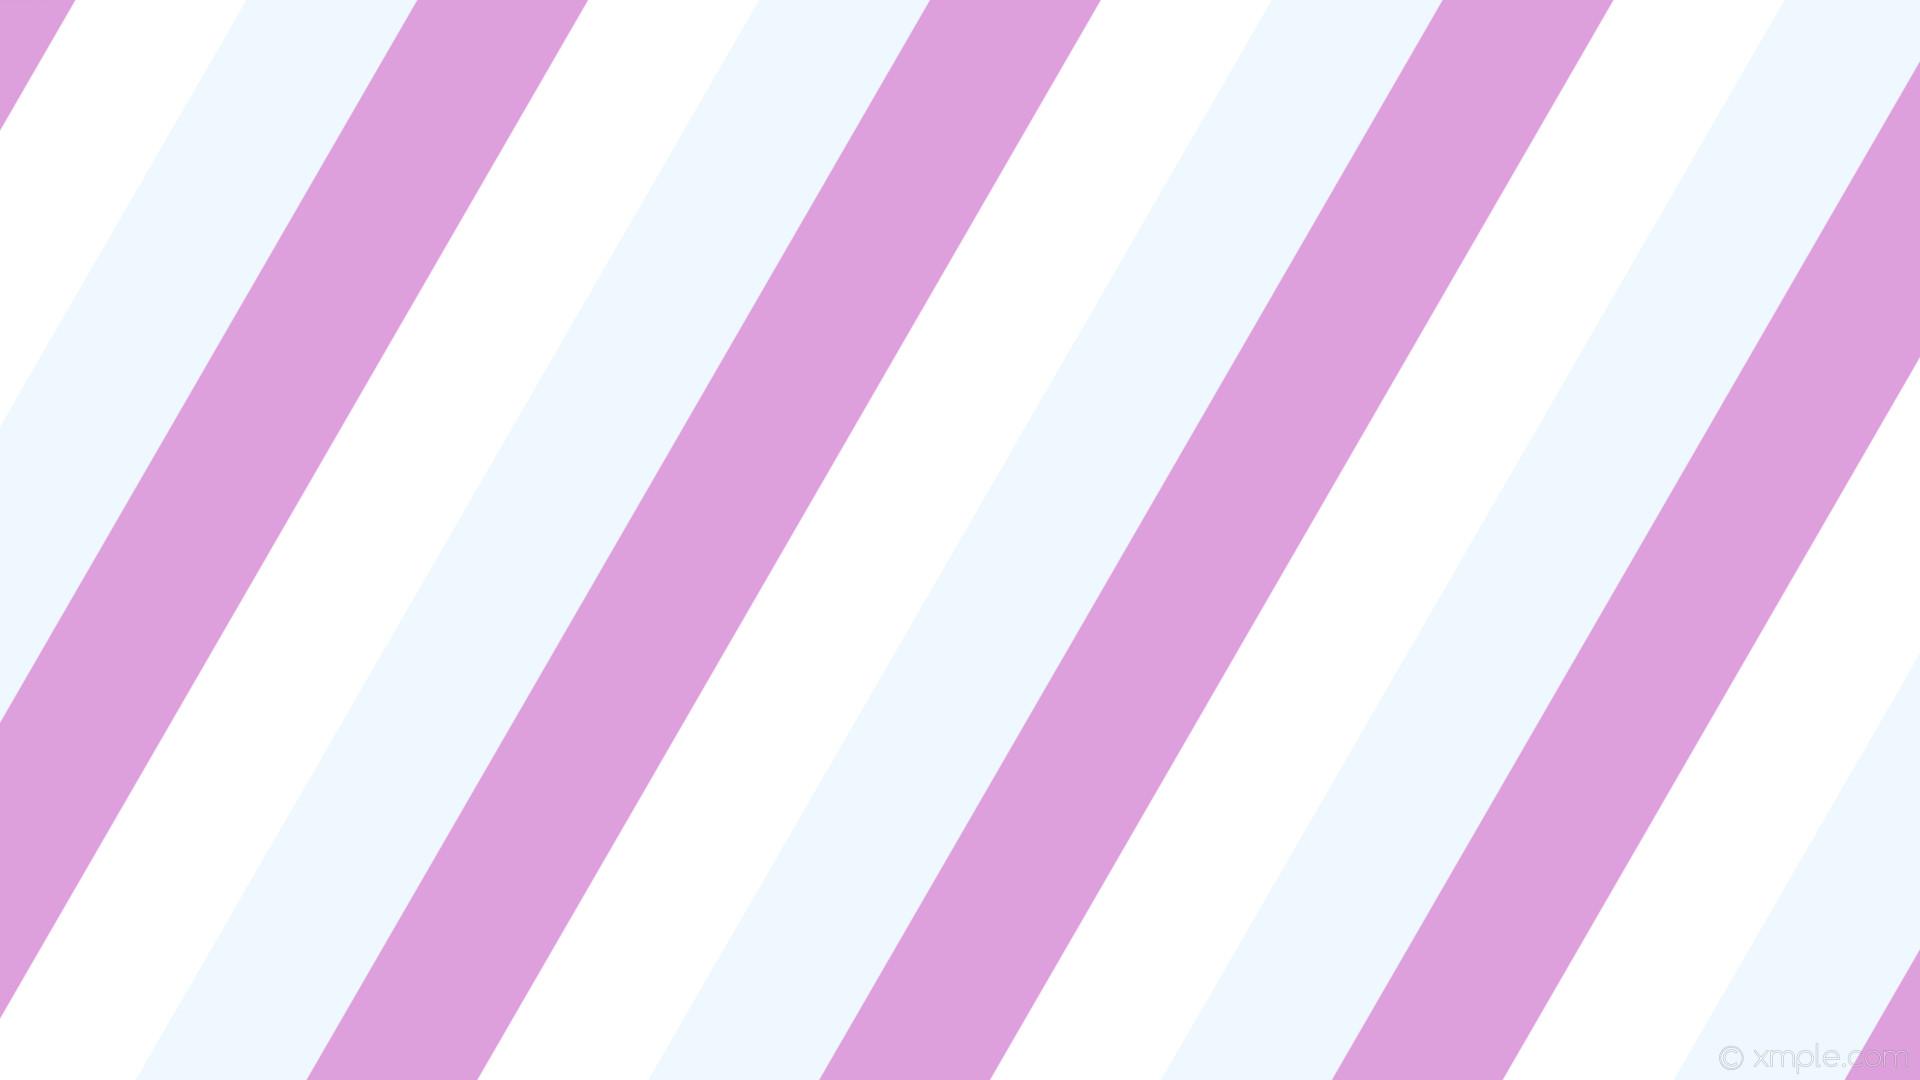 wallpaper streaks white lines purple stripes plum alice blue #ffffff  #dda0dd #f0f8ff diagonal